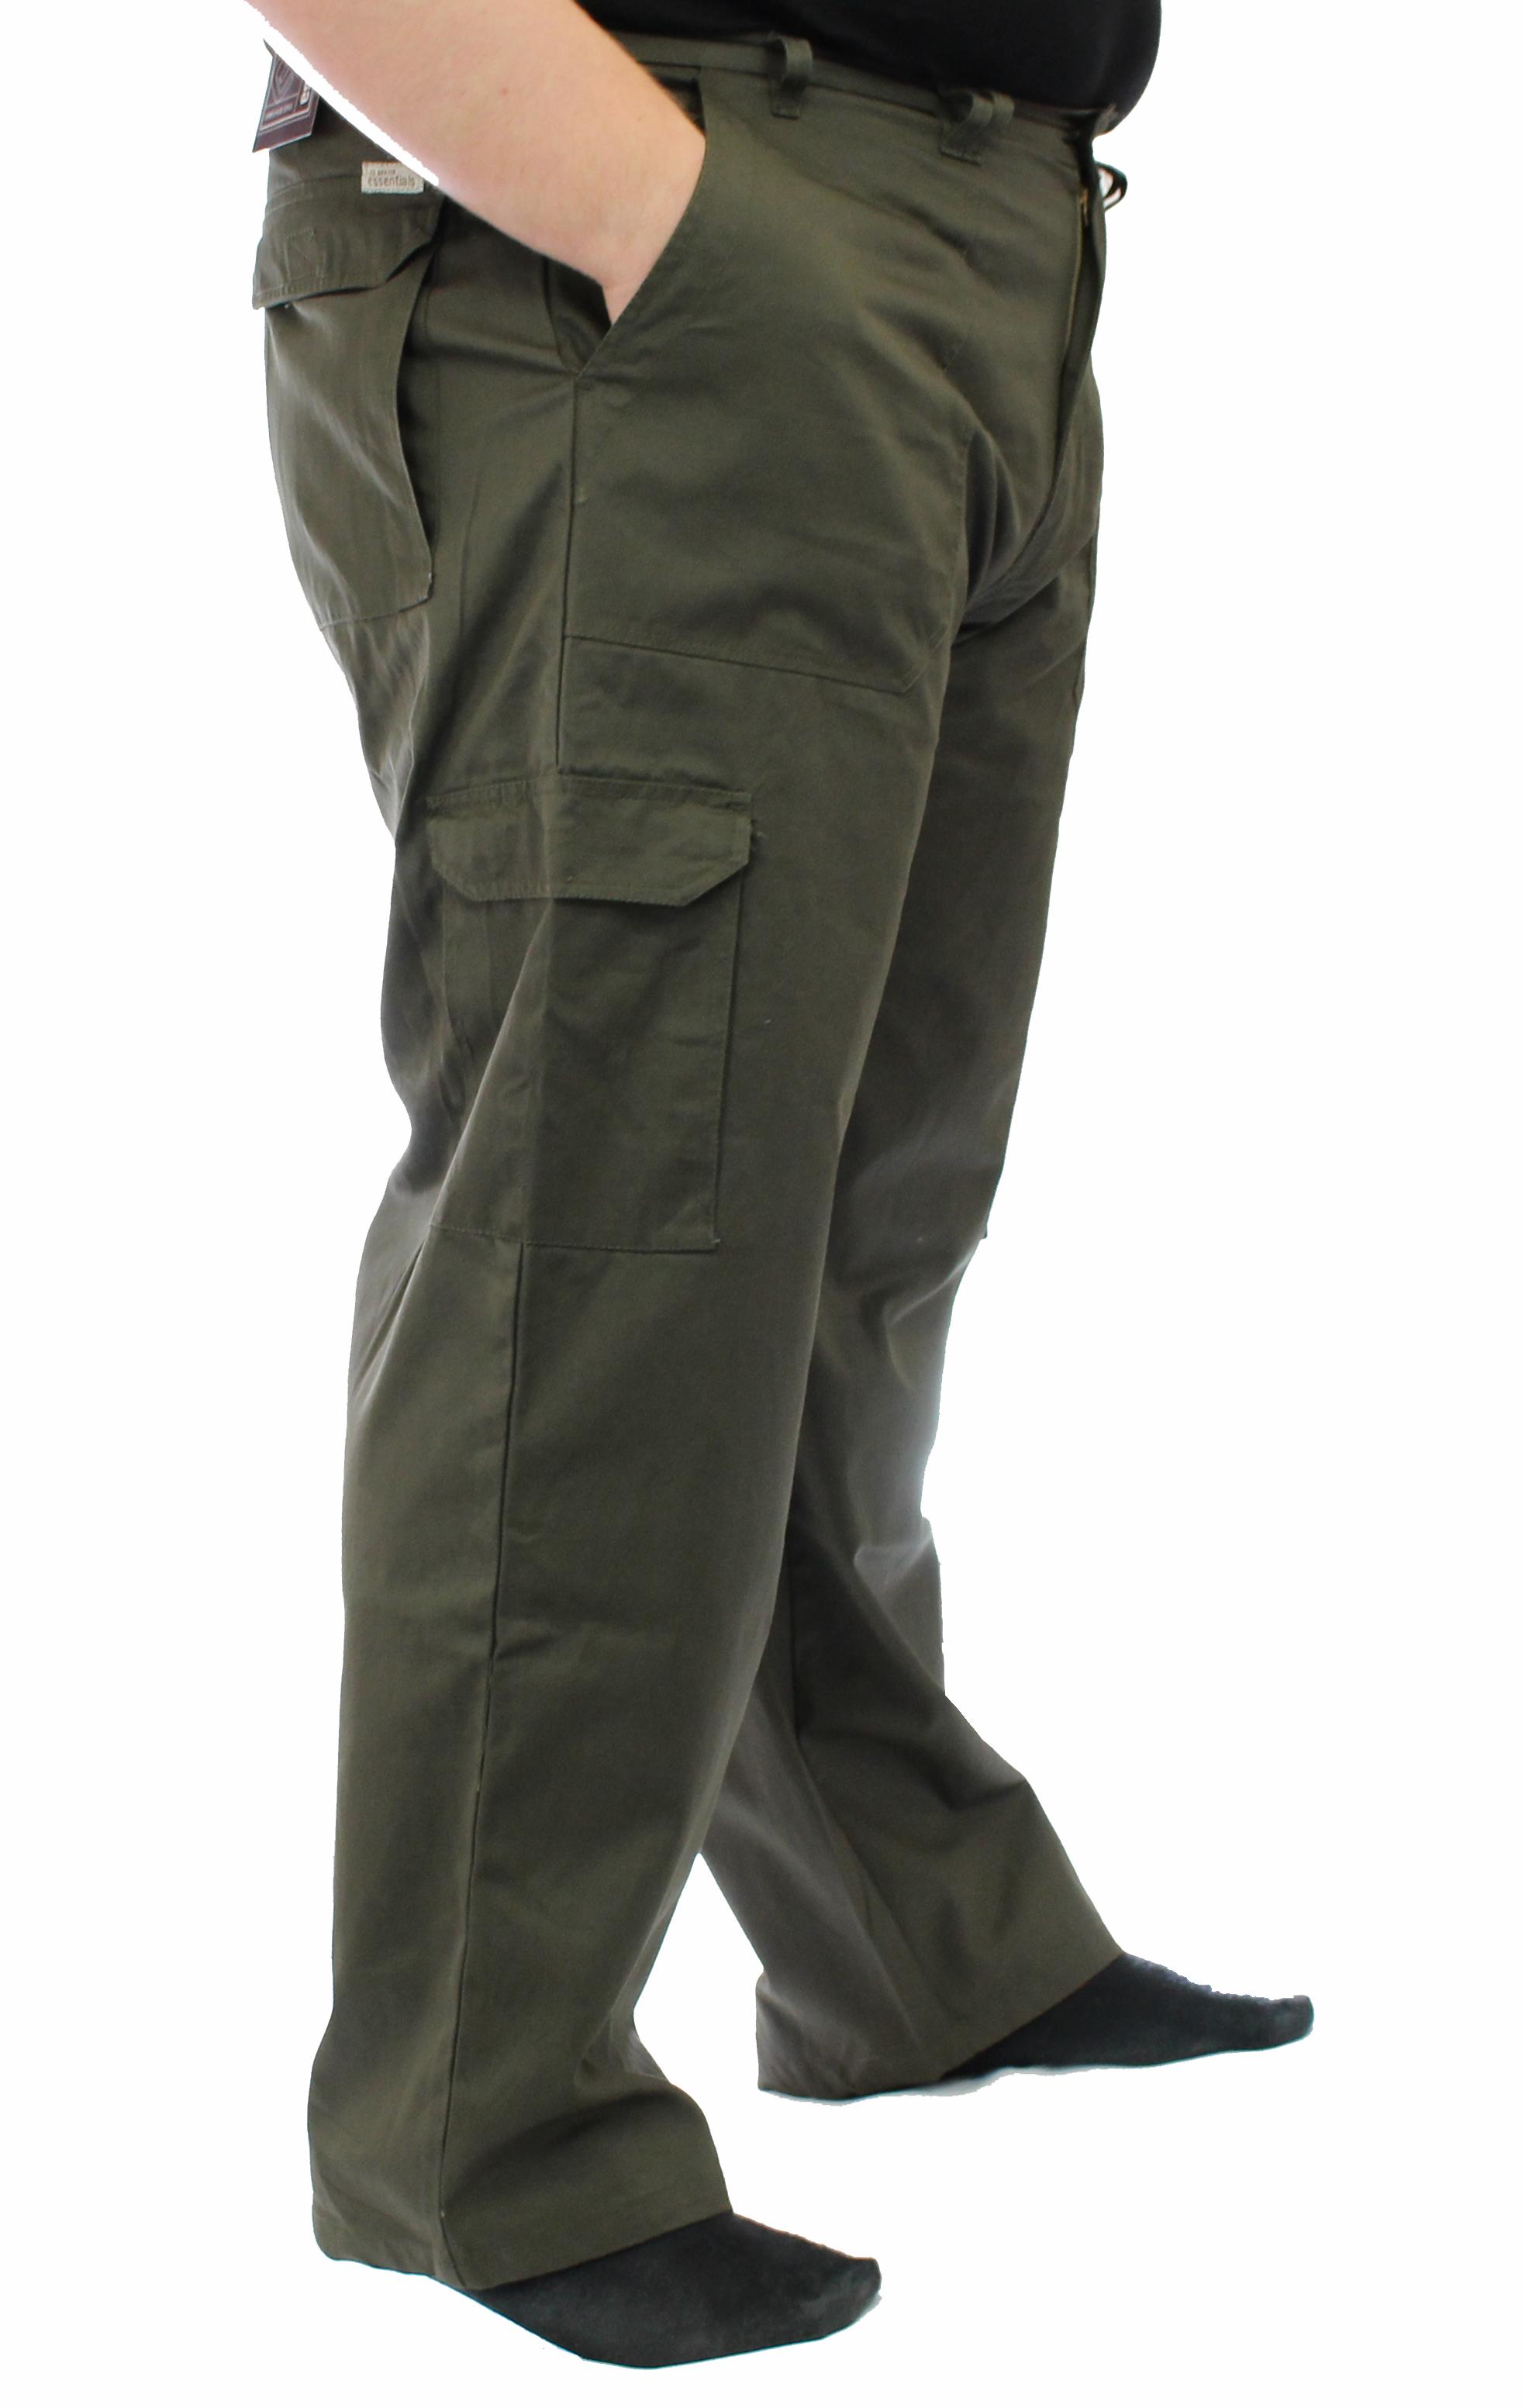 "Ed Baxter Victory - Heavy Duty Cargo Combat Trousers - Khaki - 48"" Waist, 34"" Leg"